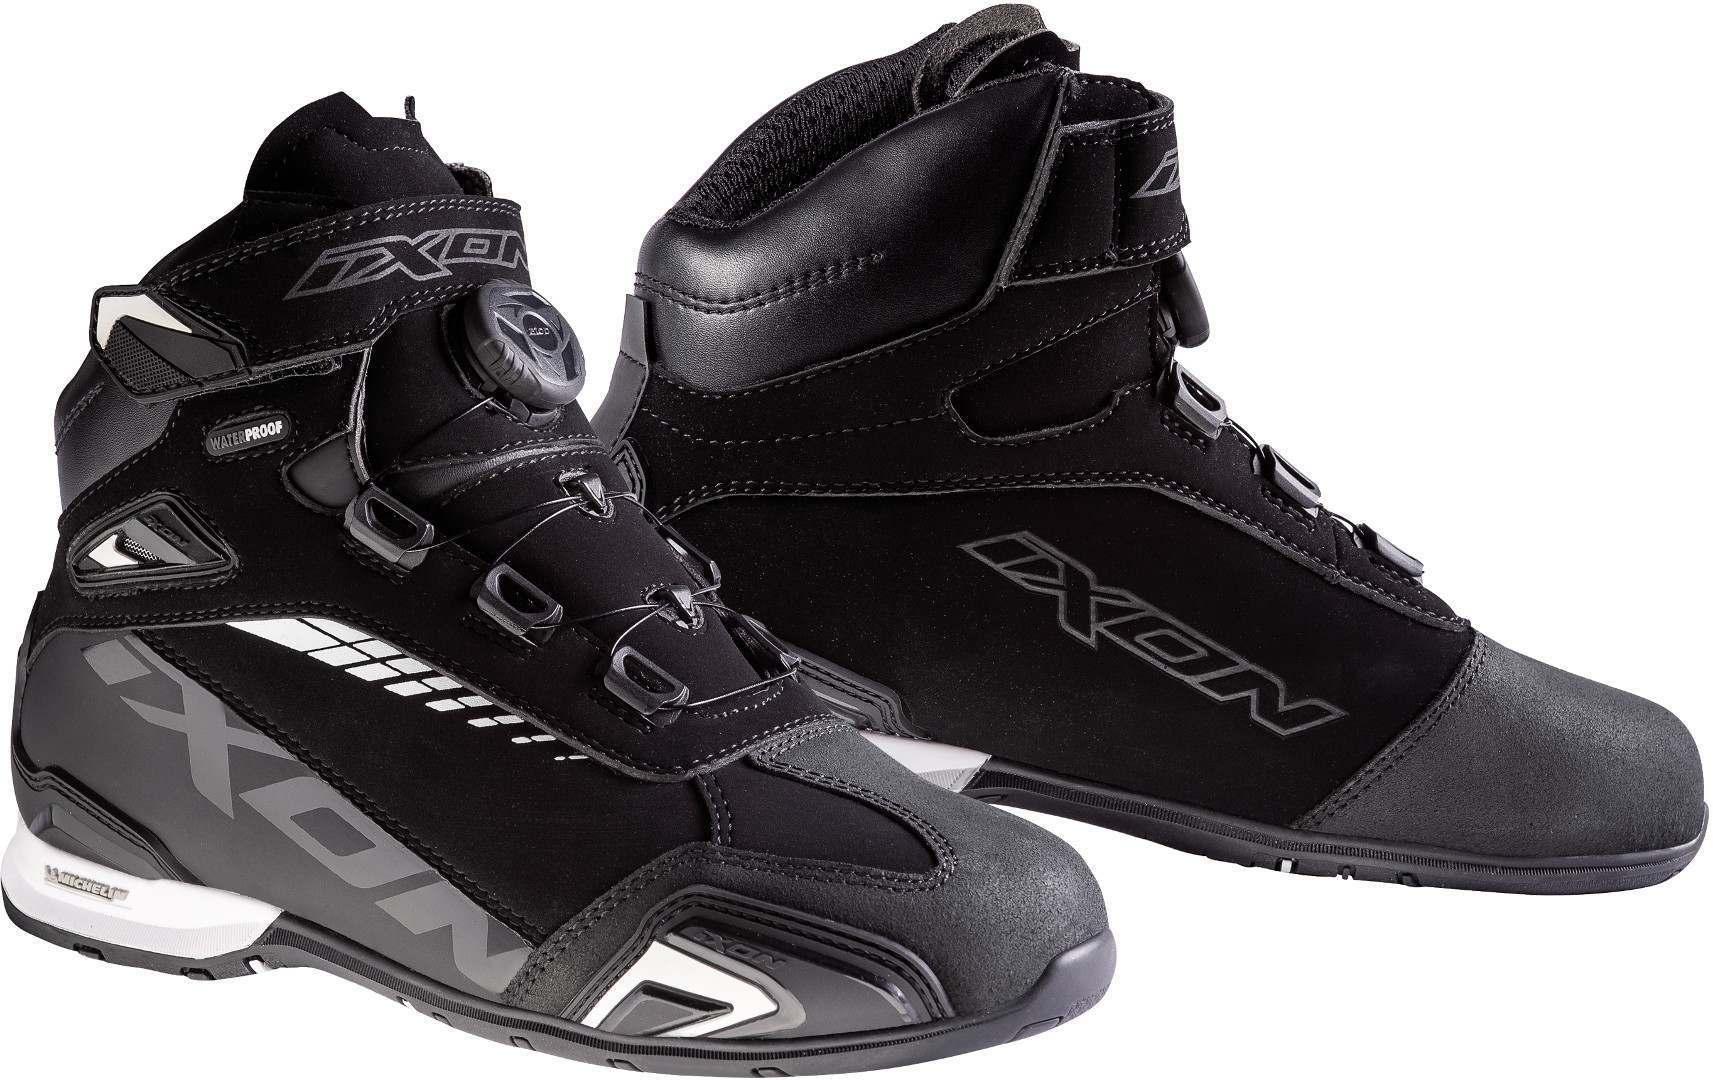 Ixon Bull WP L Ladies Motorcycle Shoes Black White 38